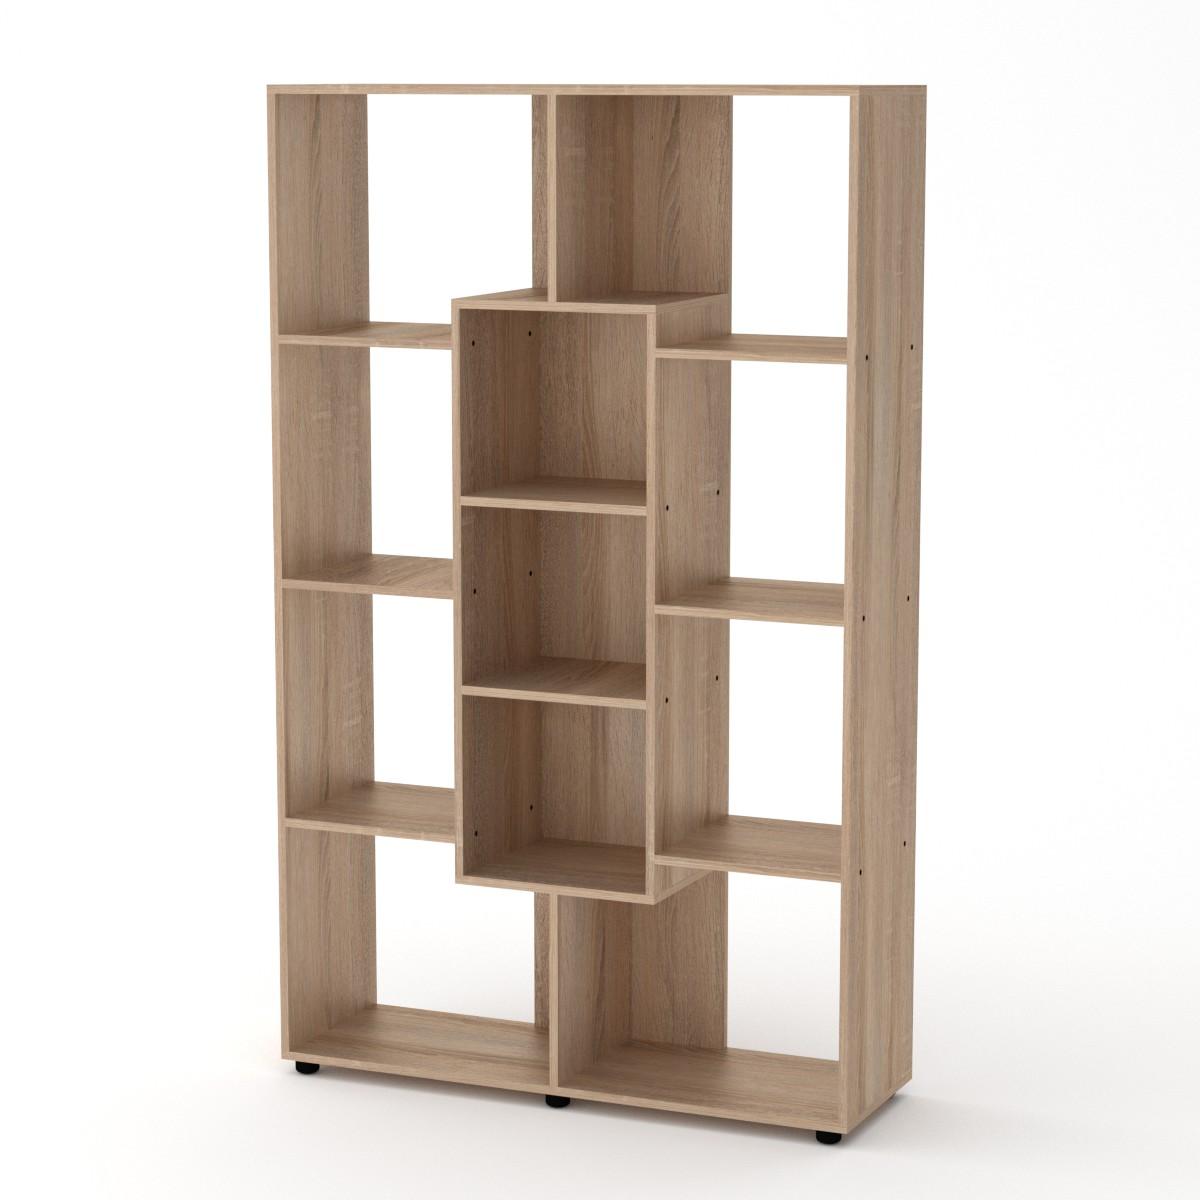 Шкаф книжный КШ-4, цвет дуб сонома